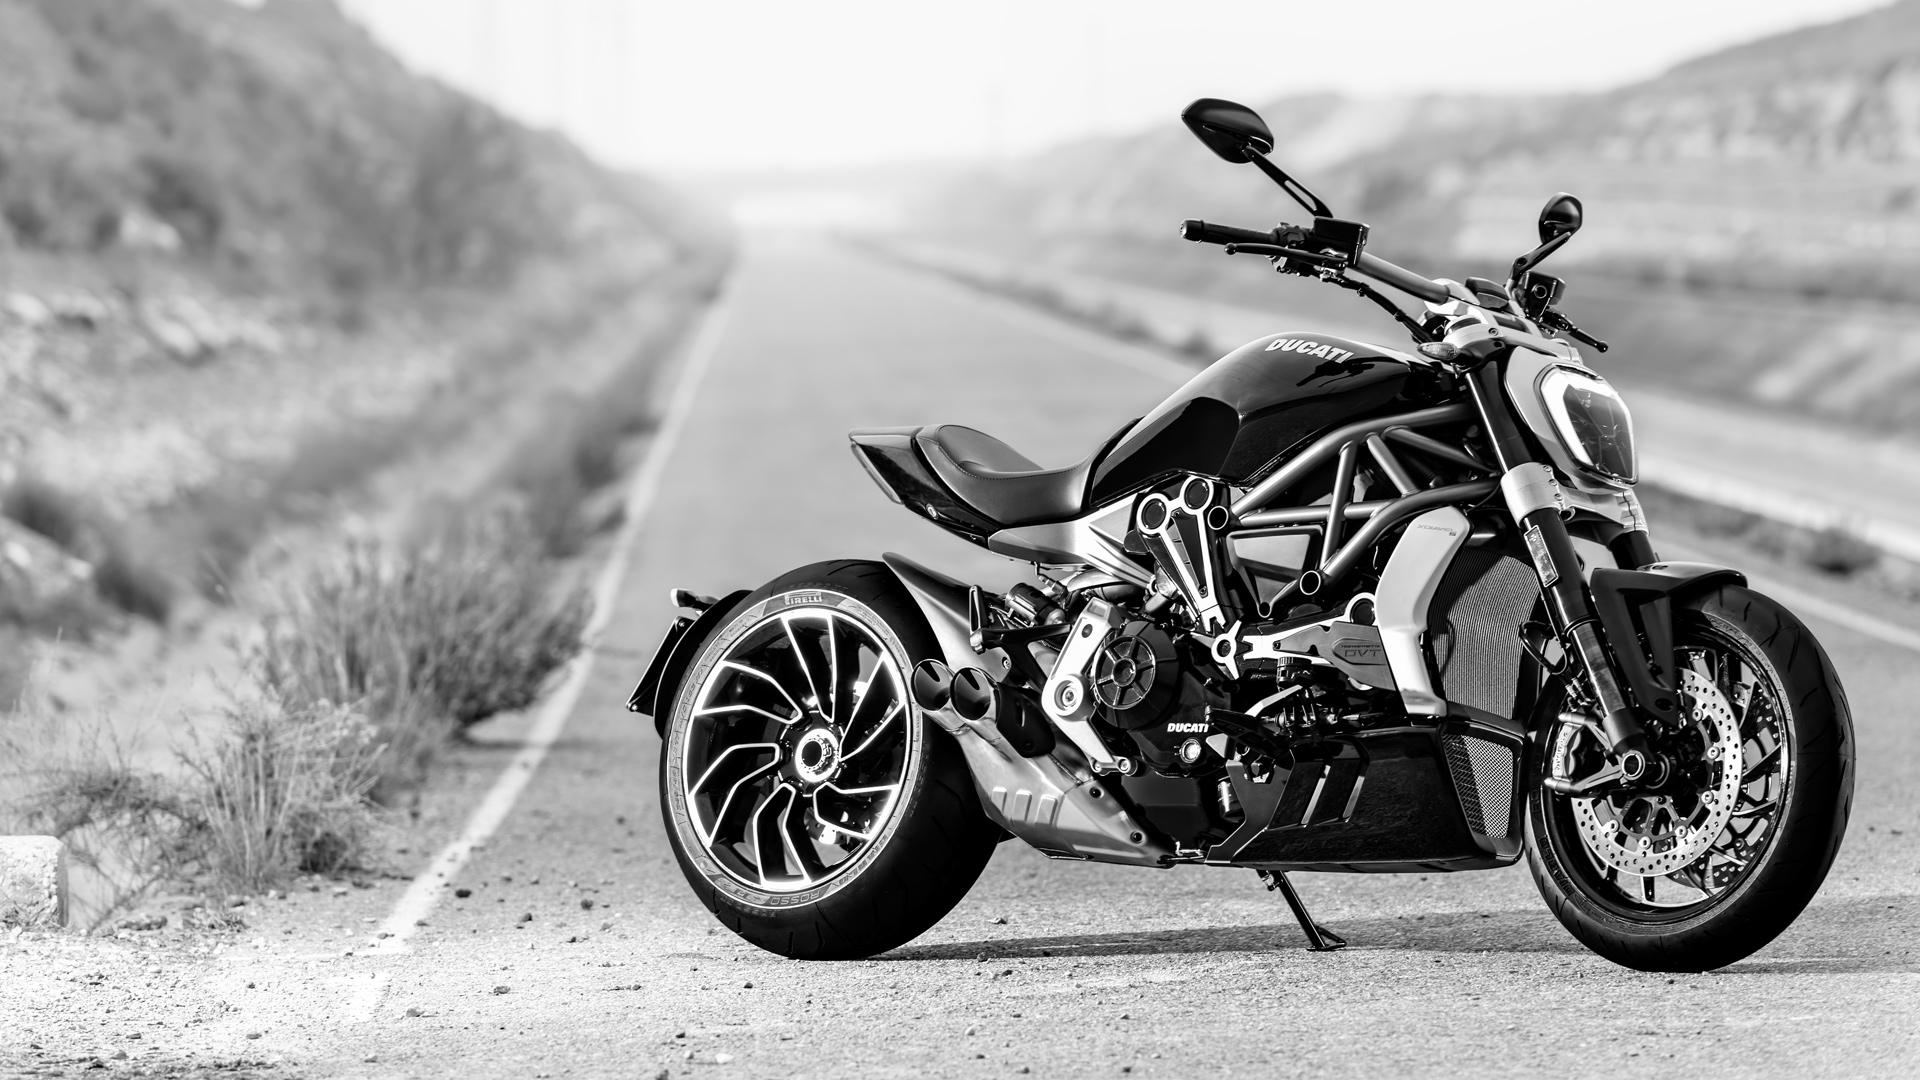 Ducati xdiavel s price